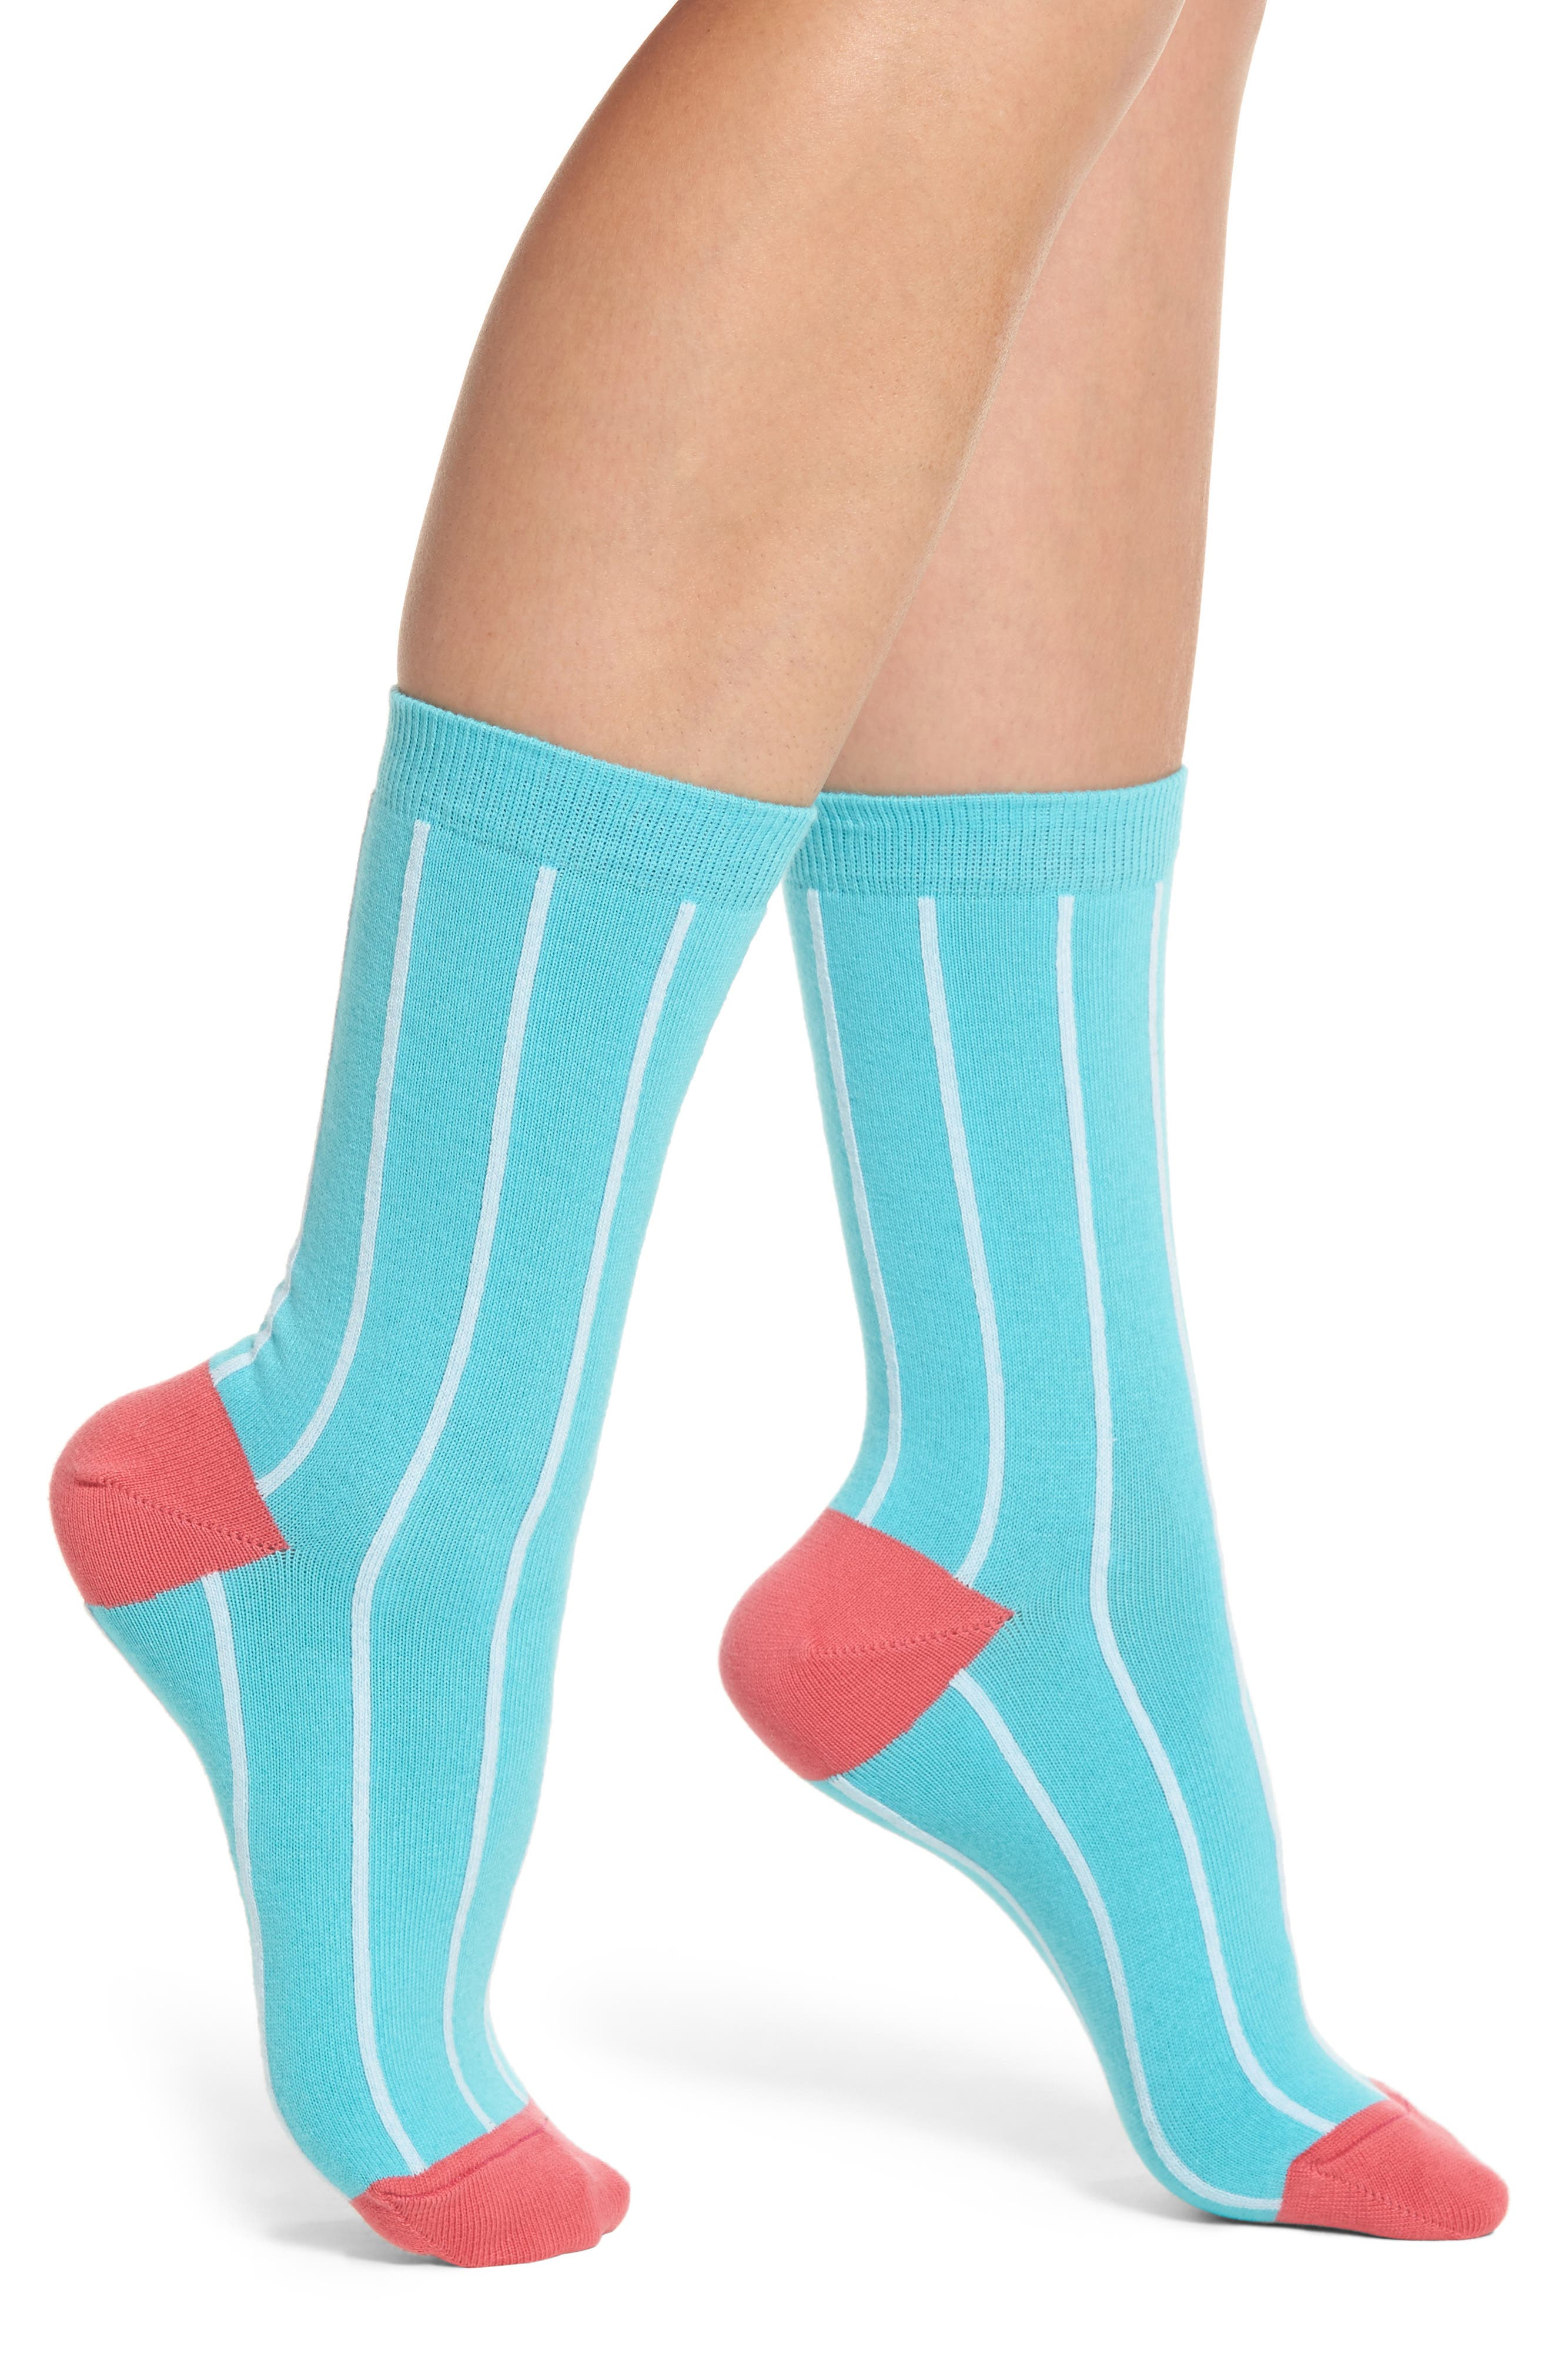 Edna Pinstripe Crew Socks,                         Main,                         color, Teal